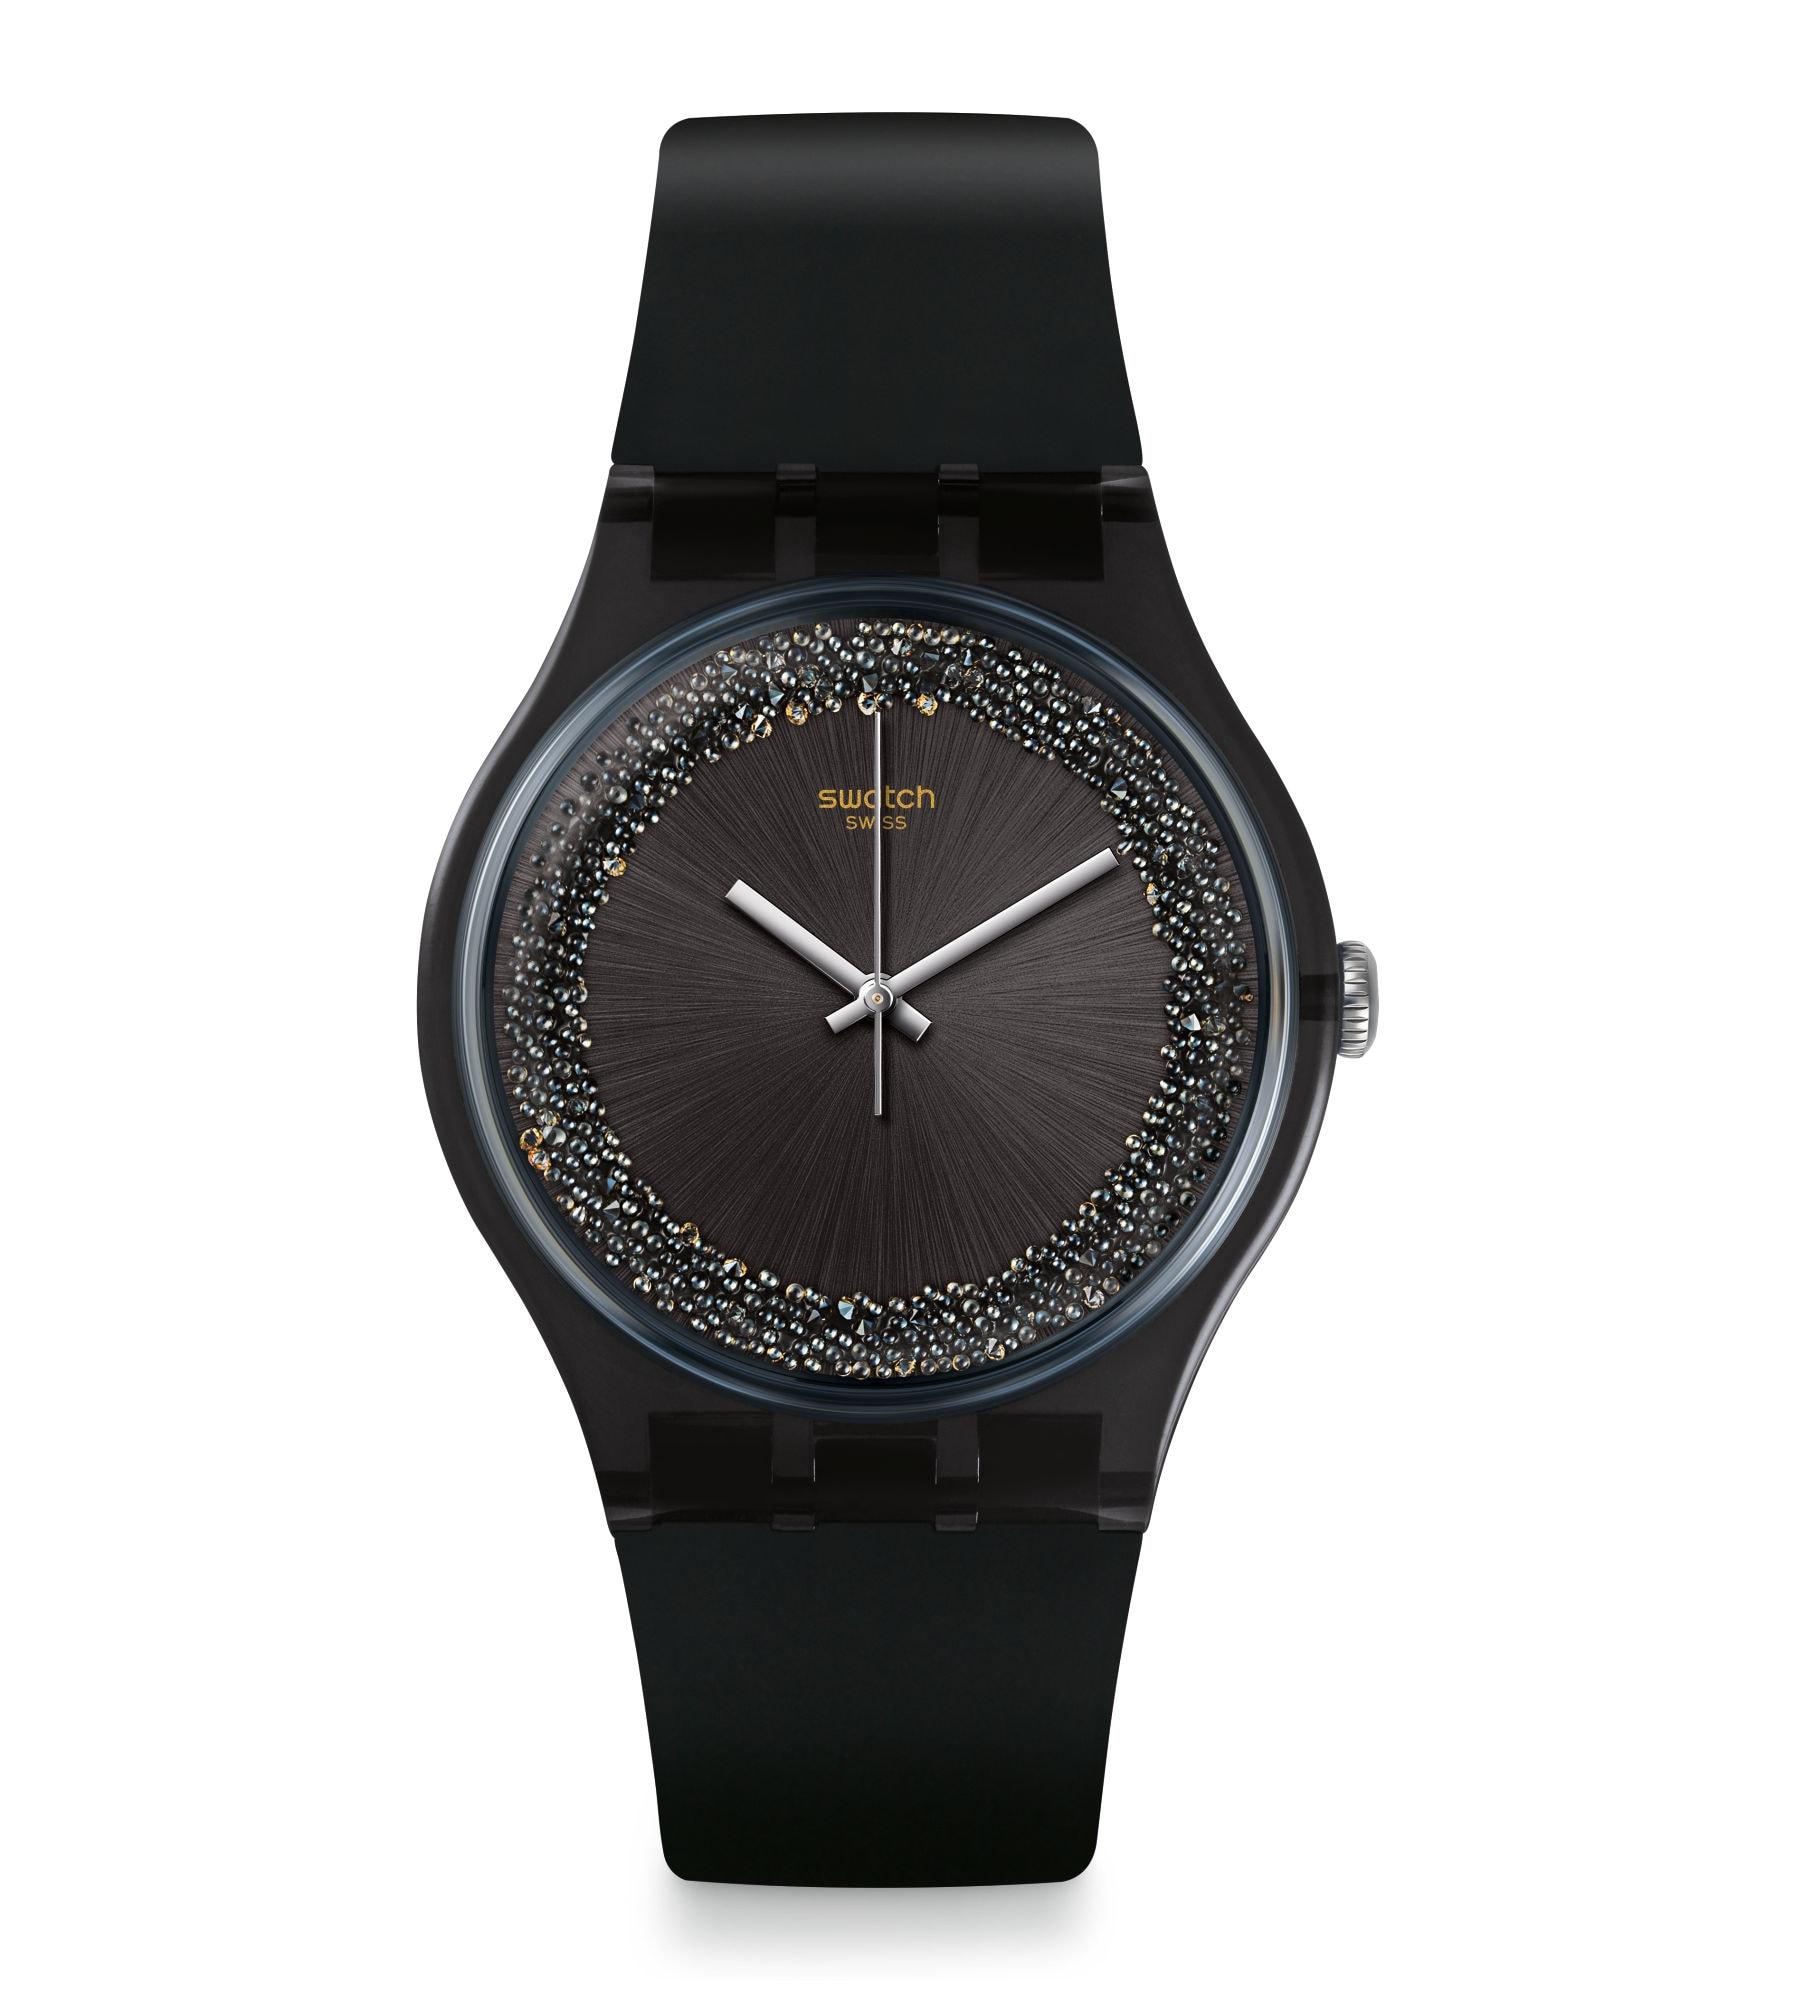 Darksparkles Swatch Darksparkles Swatch Darksparkles Armbanduhr Suob156 Darksparkles Suob156 Suob156 Armbanduhr Armbanduhr Swatch Swatch doxBCe